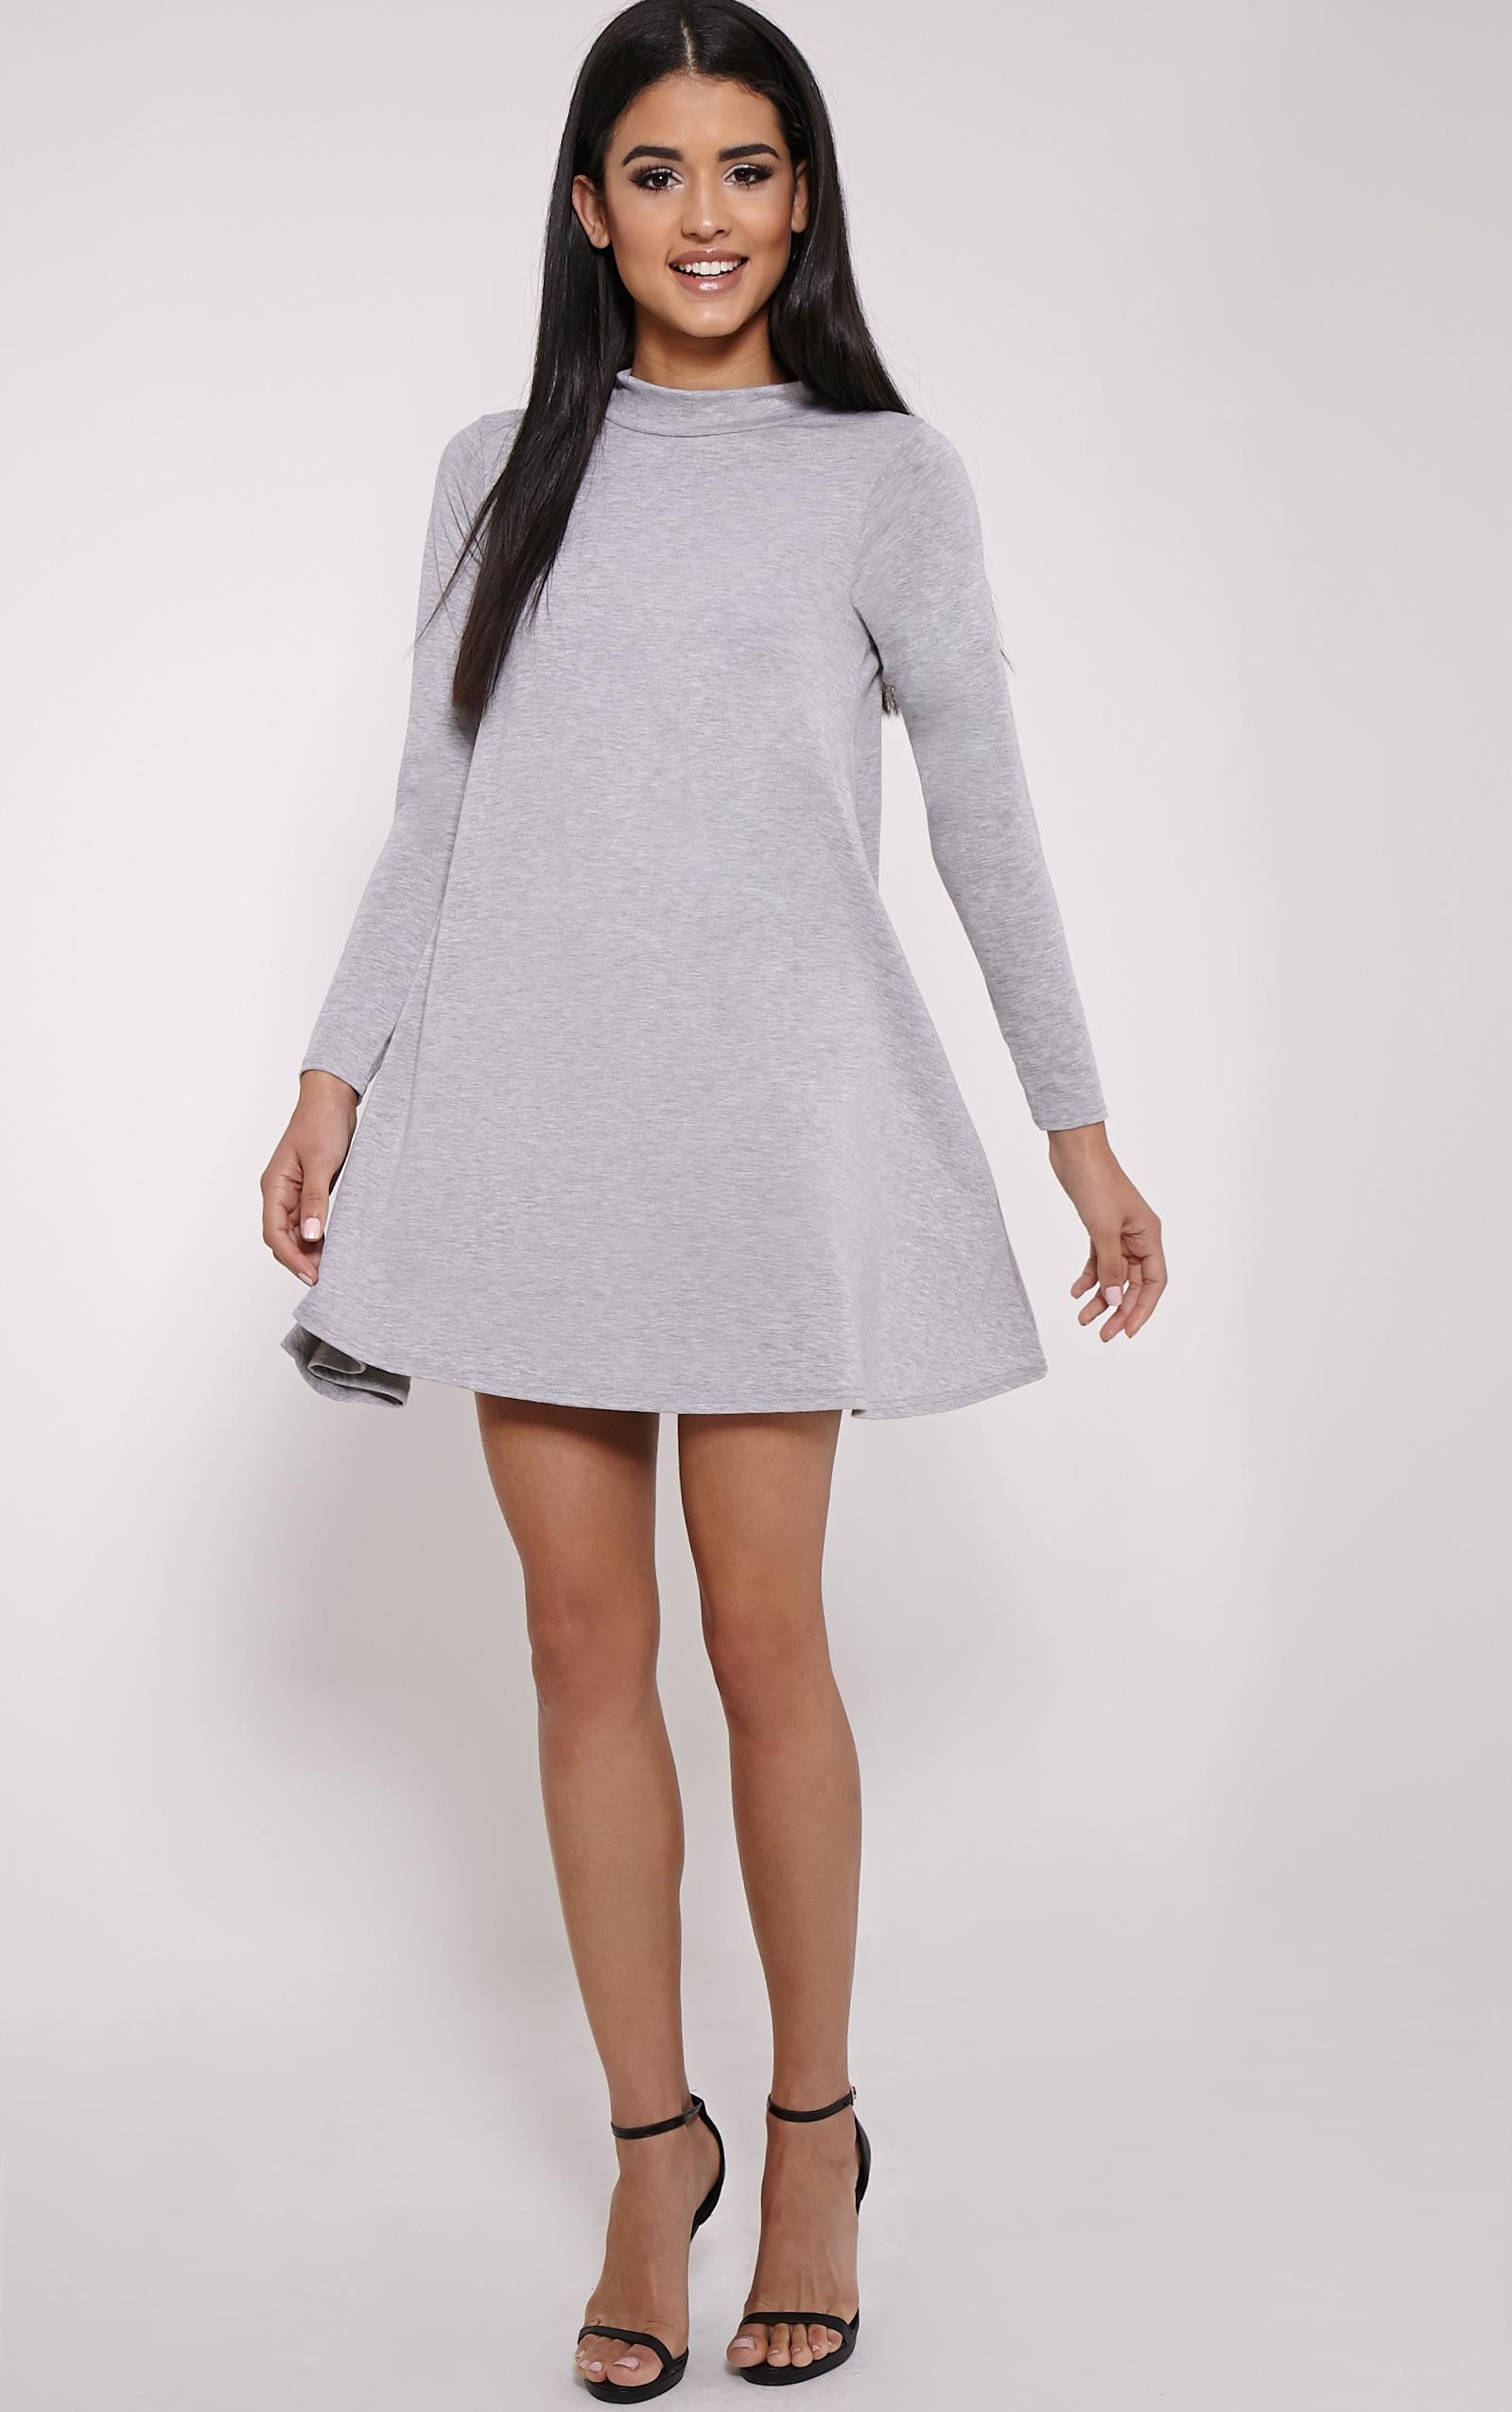 Basic Marl Grey Long Sleeved Jersey Swing Dress 3